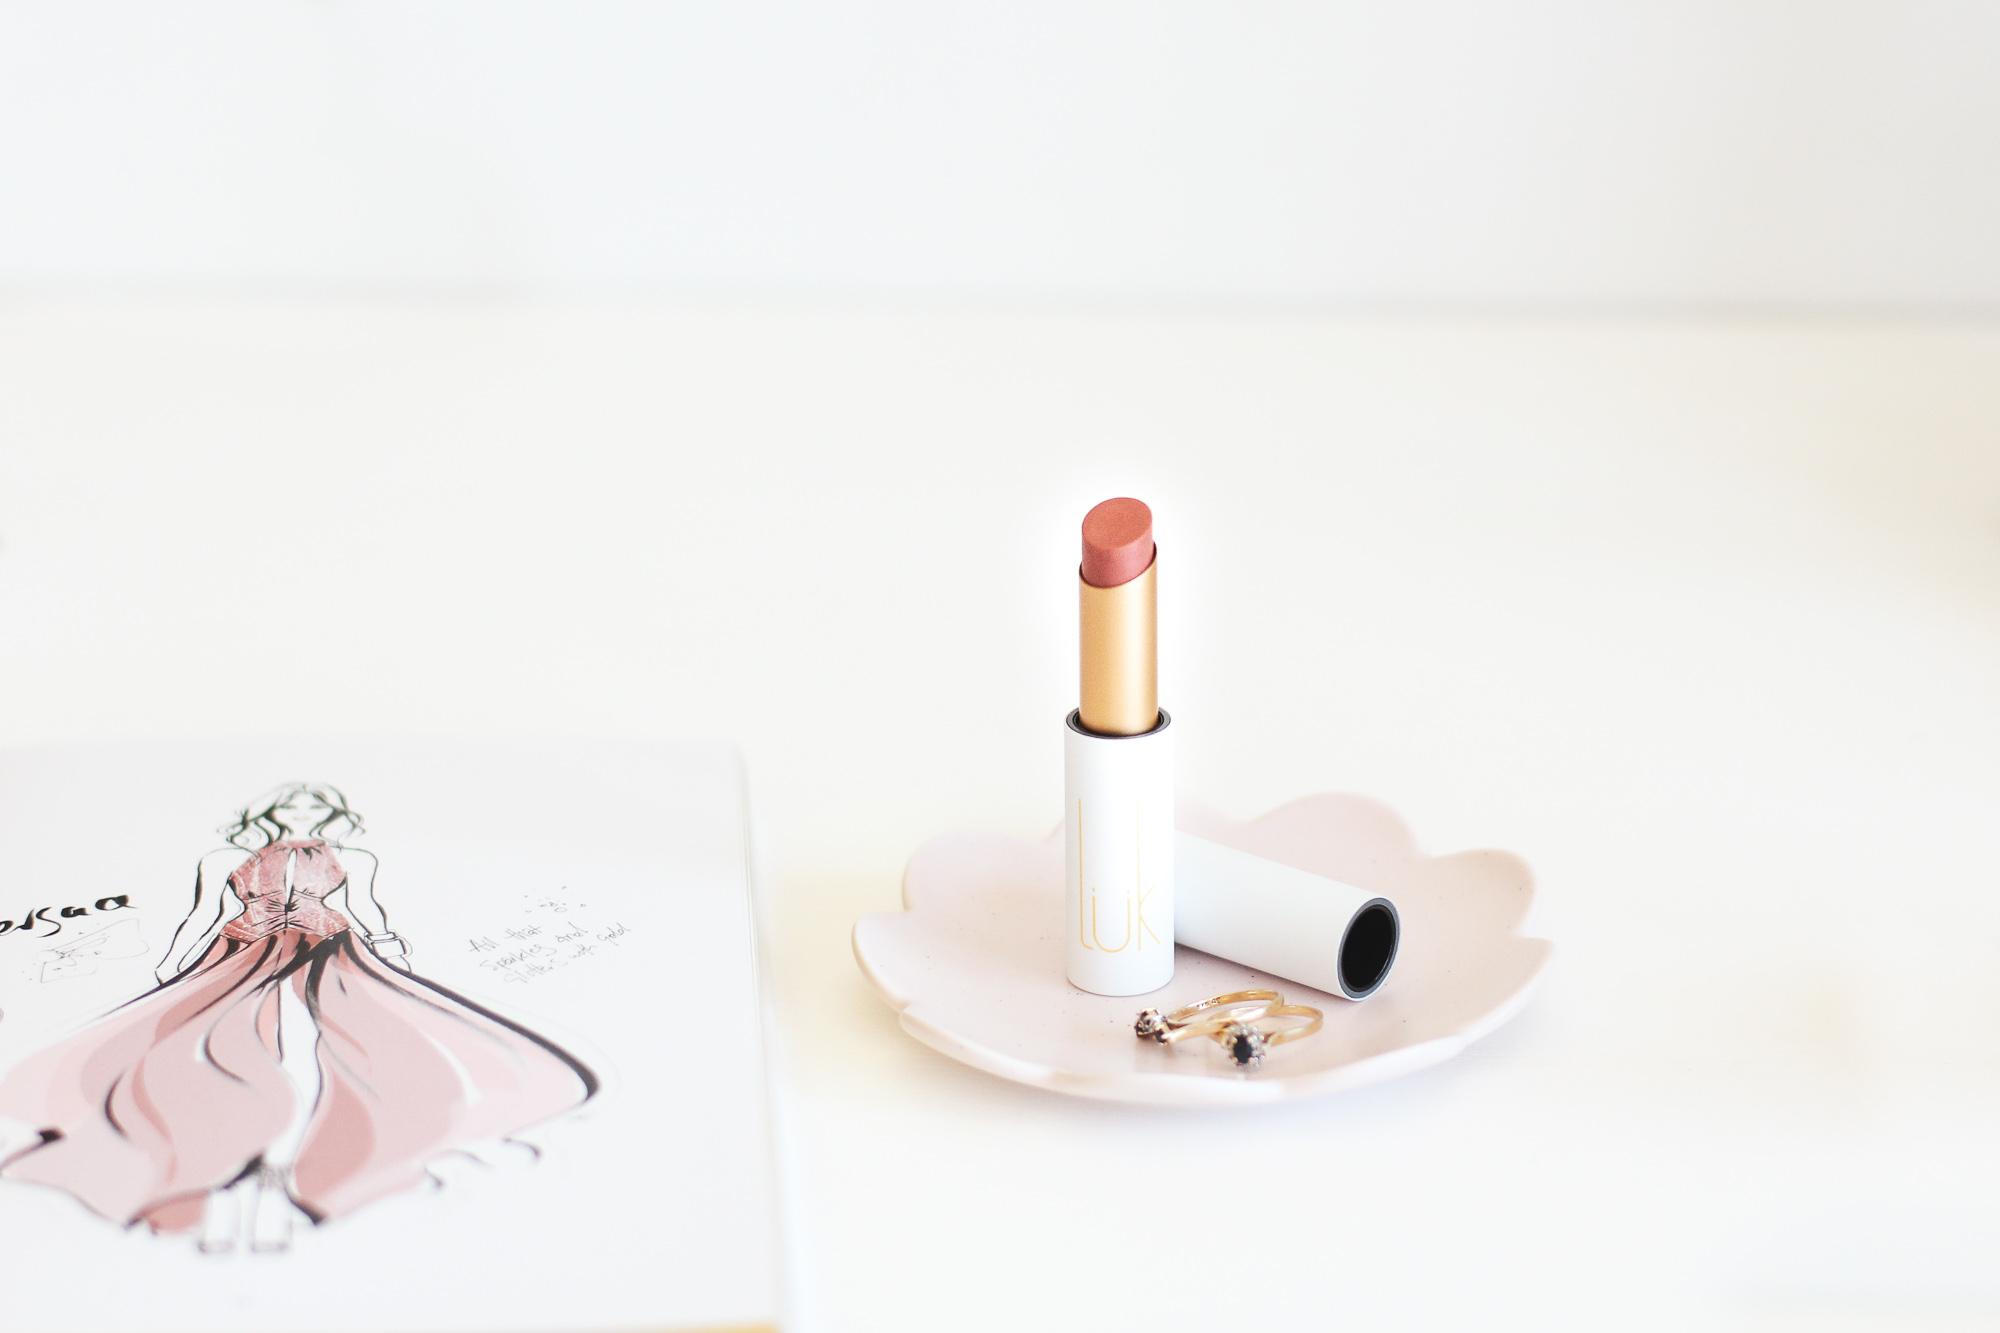 LUK Beautifood Lipstick 14.jpg